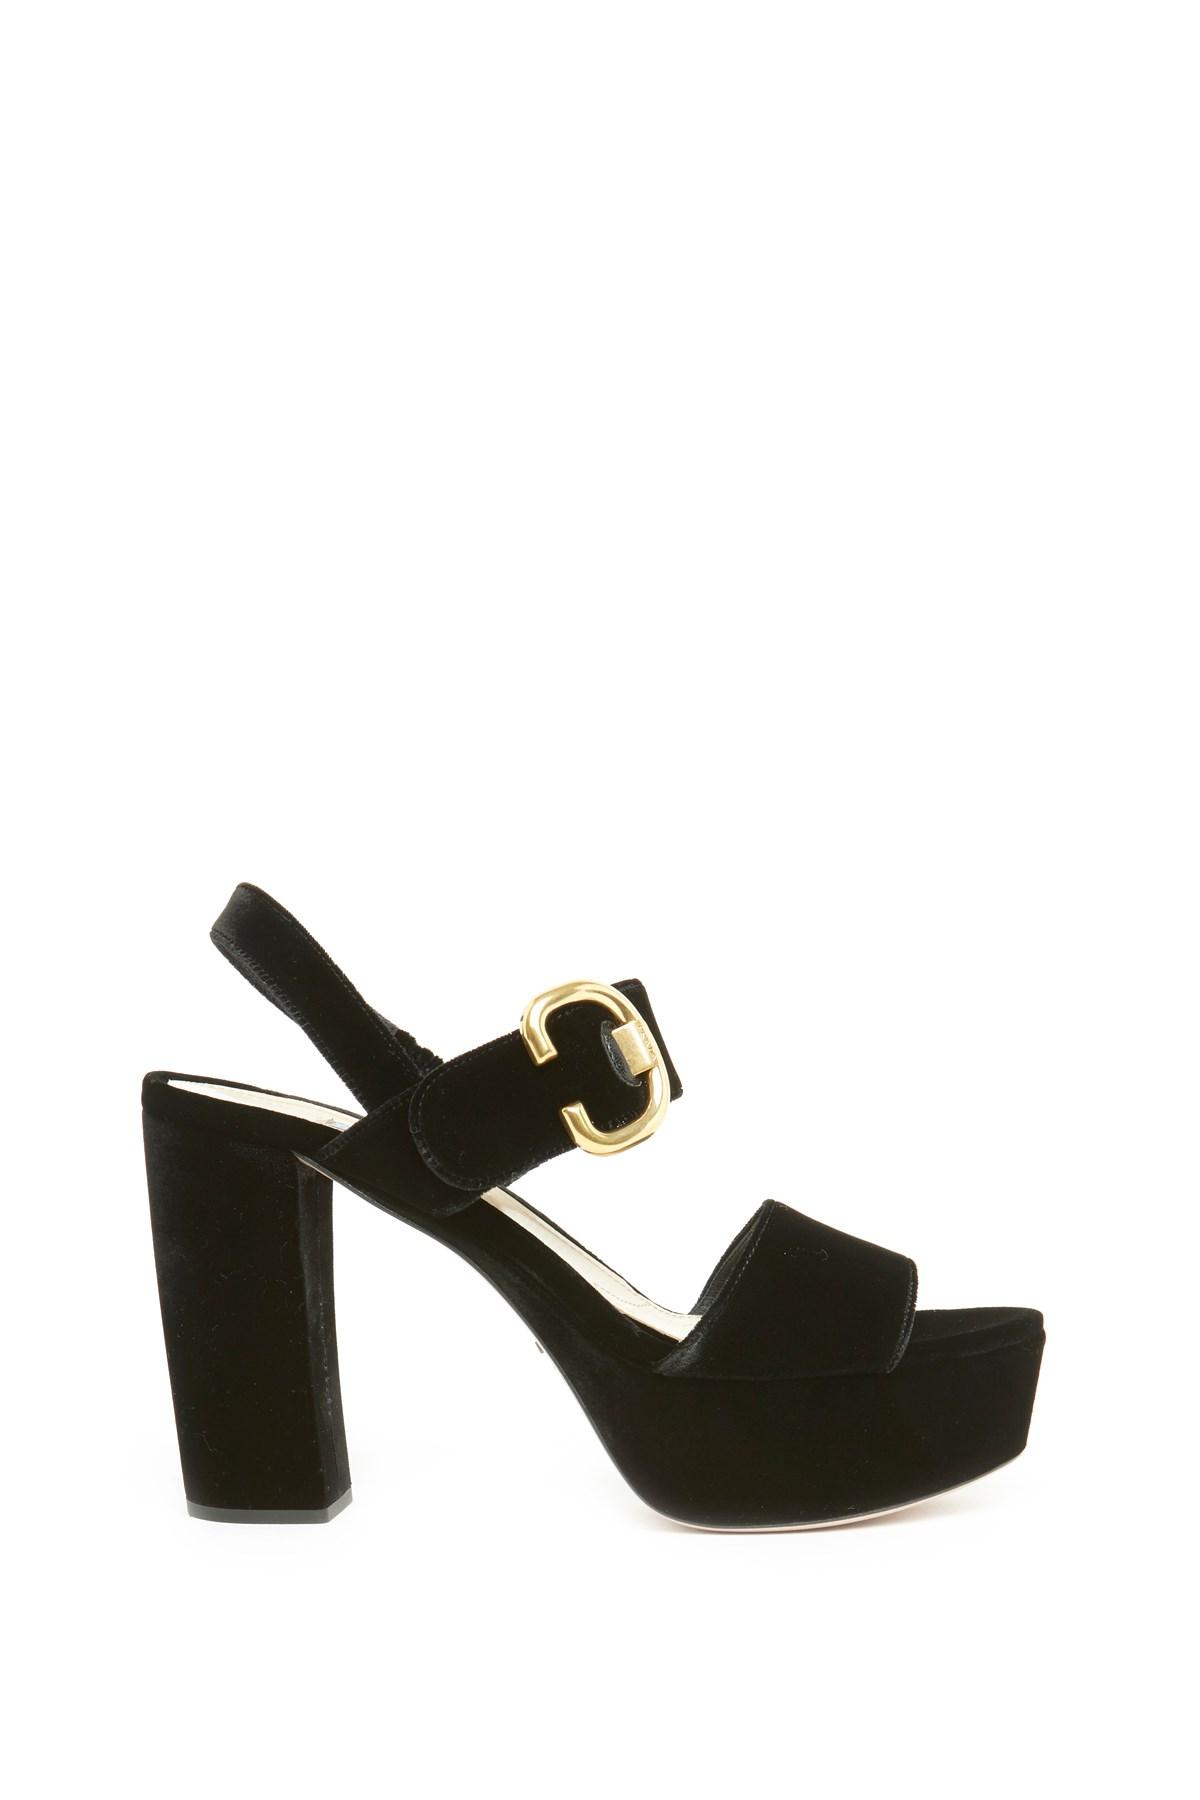 33e8735ade8db7 prada velvet sandals available on julian-fashion.com - 50362